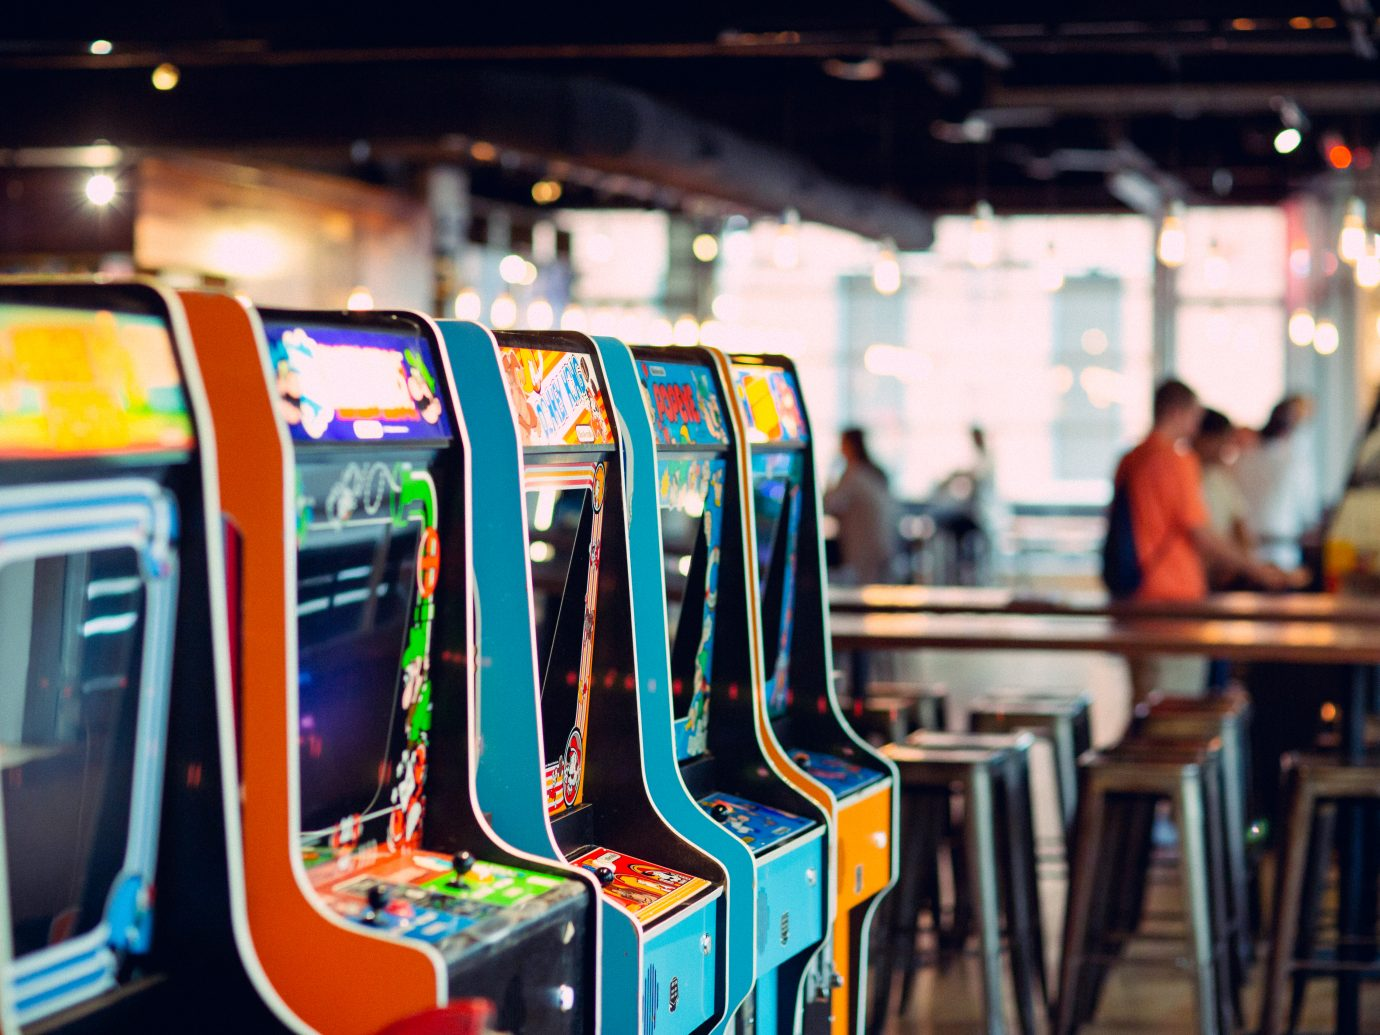 video games at 16 Bit Bar + Arcade